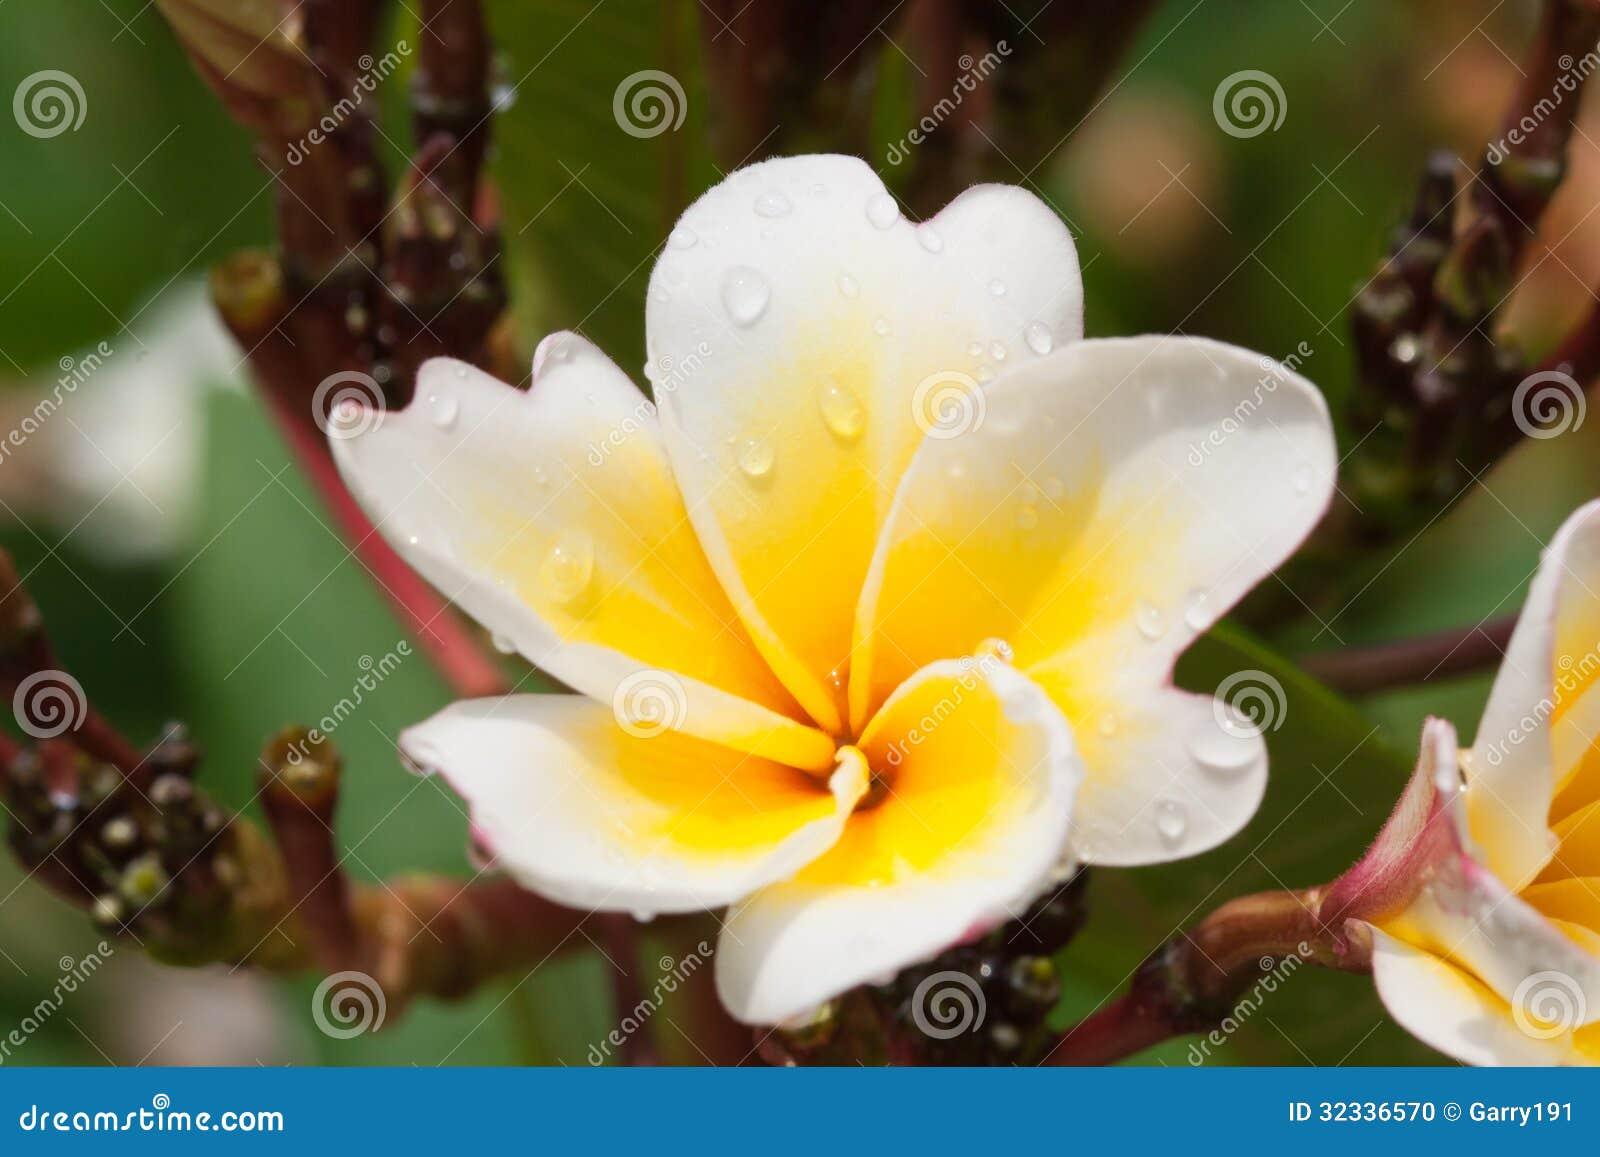 Plumeria Flowers Closeup Tropical Plant Stock Photo